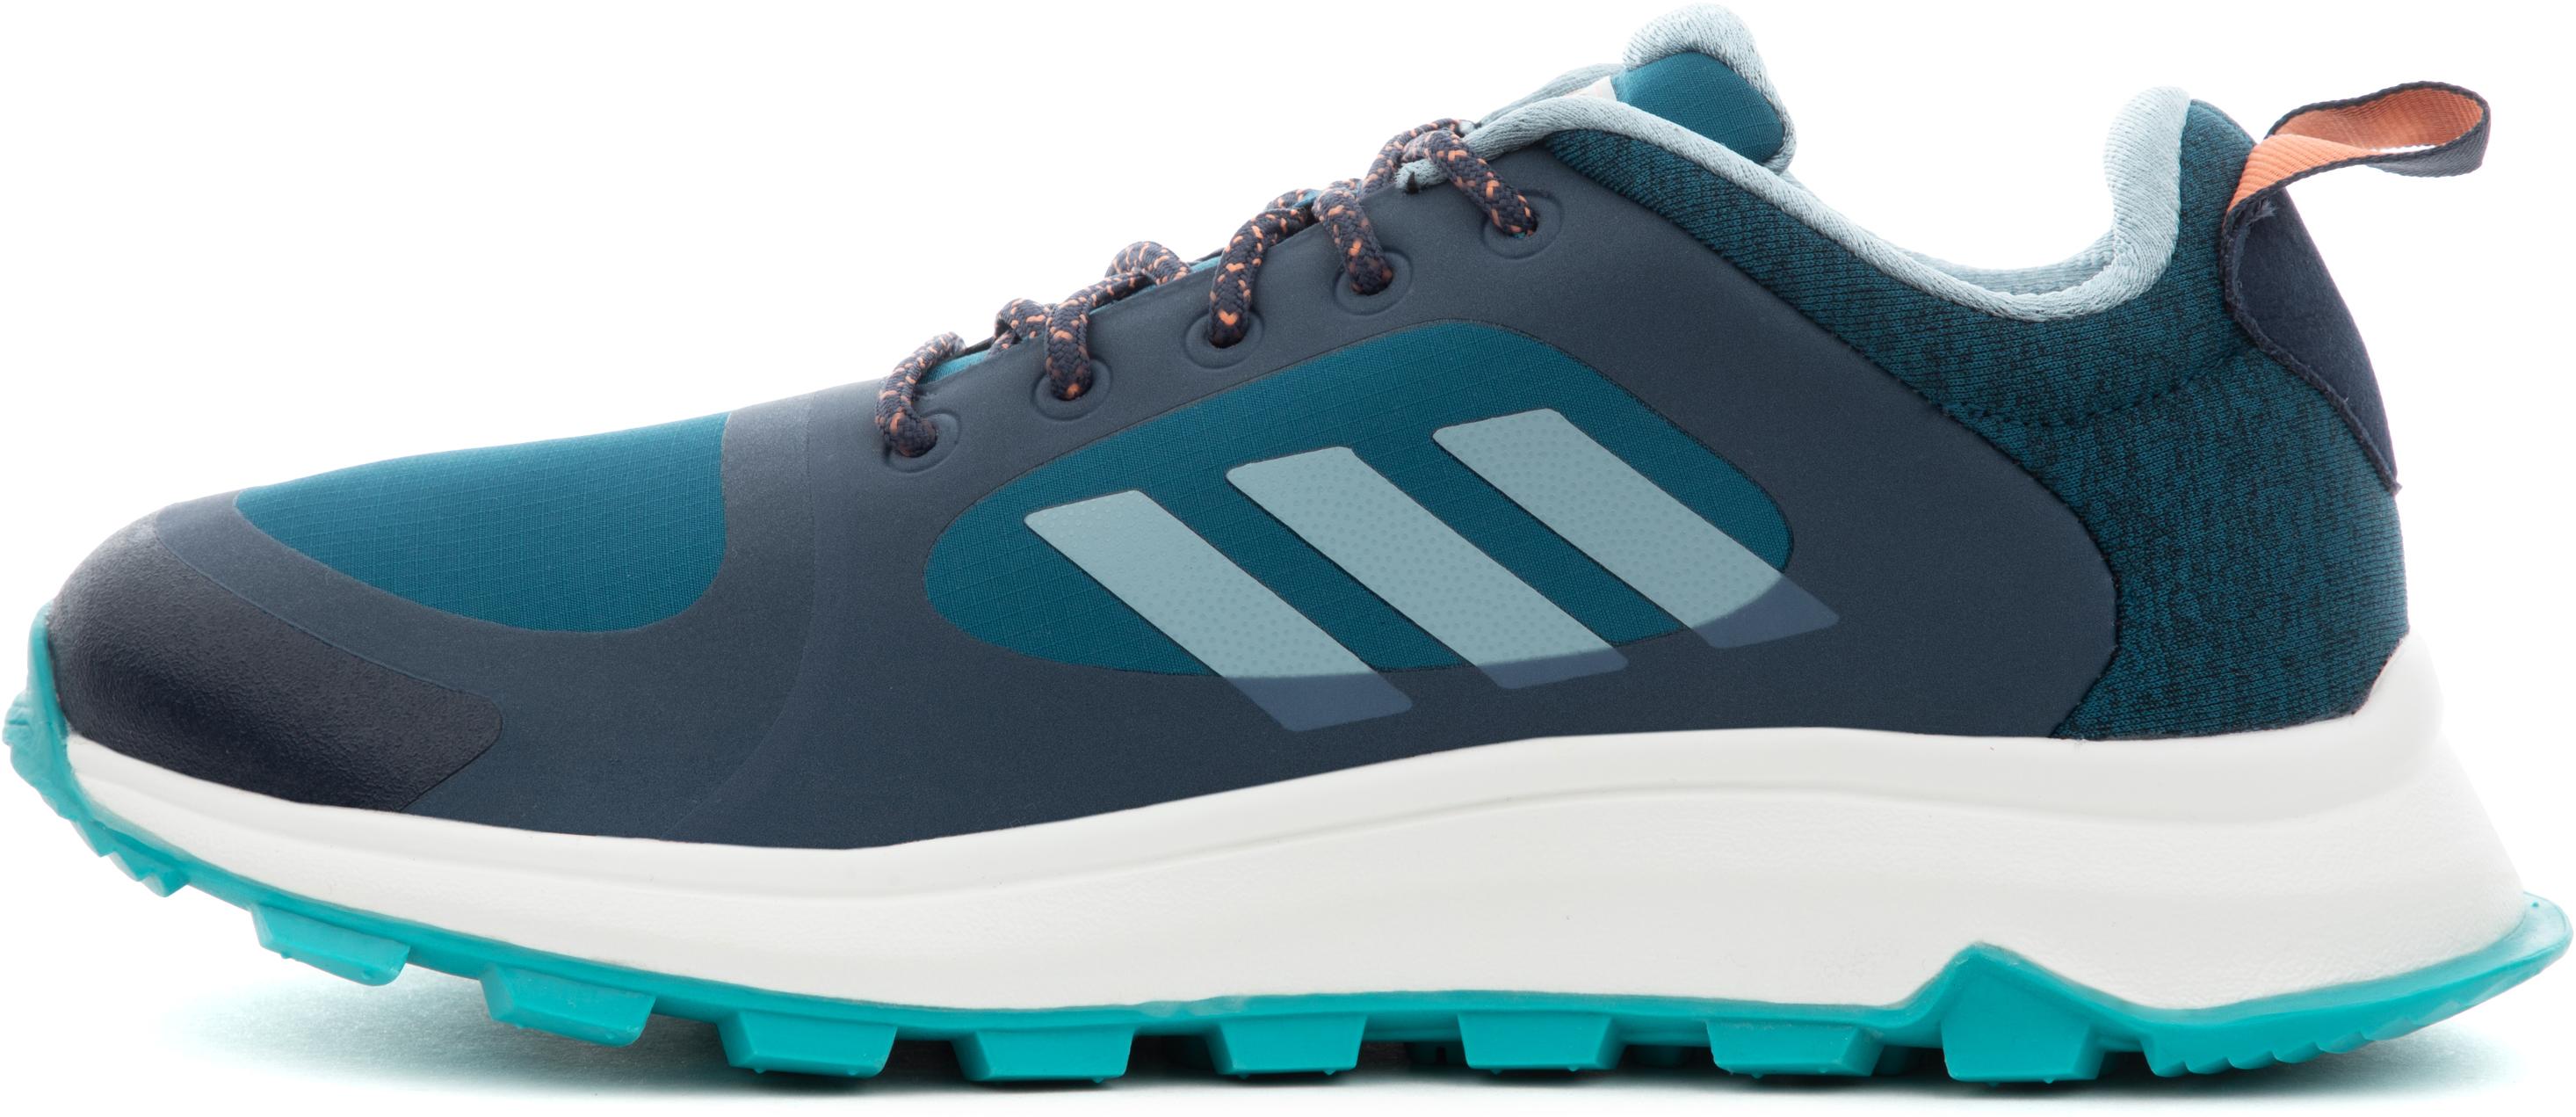 Adidas Кроссовки женские Adidas Response Trail X, размер 38,5 цена